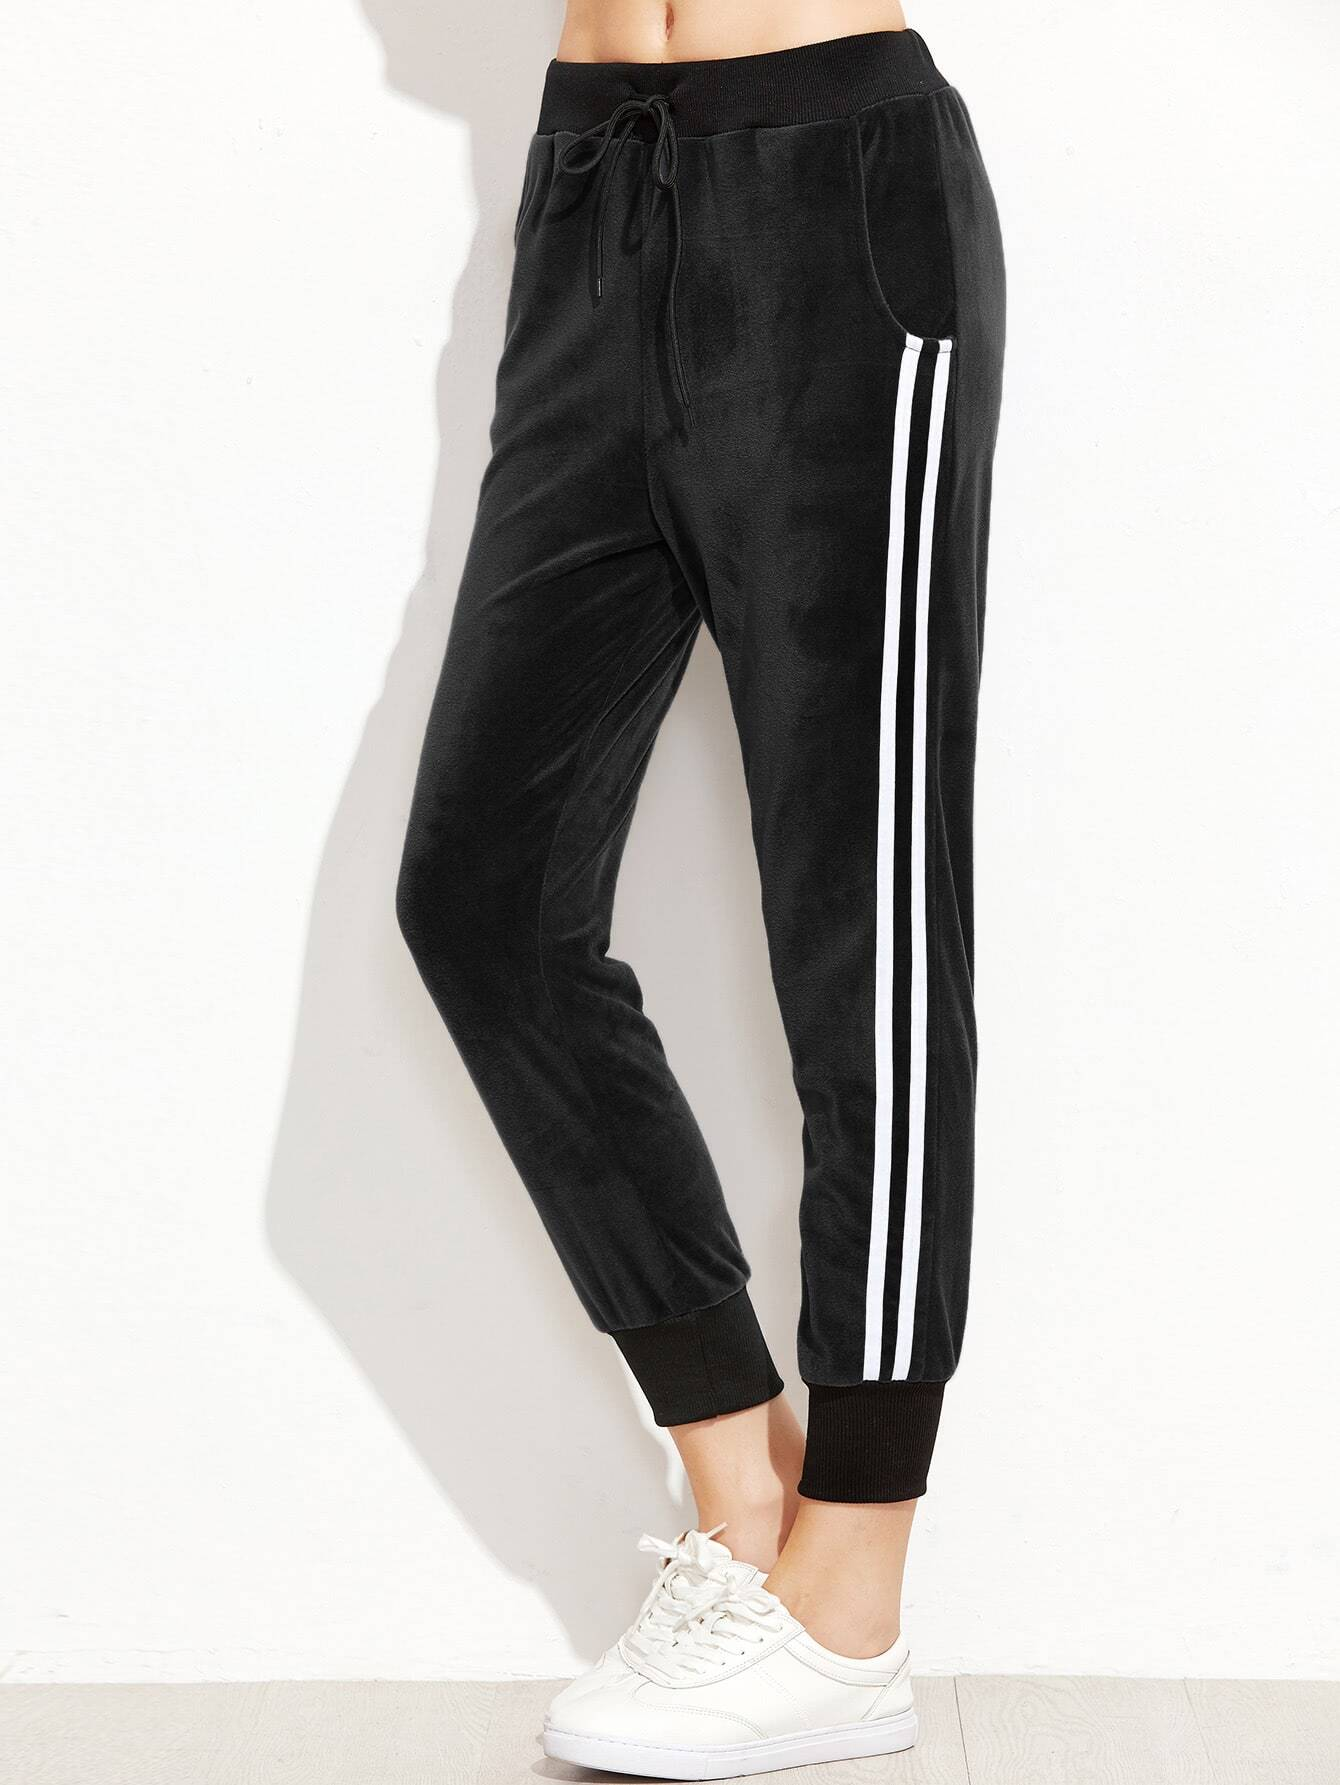 Black Ribbed Trim Striped Side Velvet PantsBlack Ribbed Trim Striped Side Velvet Pants<br><br>color: Black<br>size: L,M,S,XL